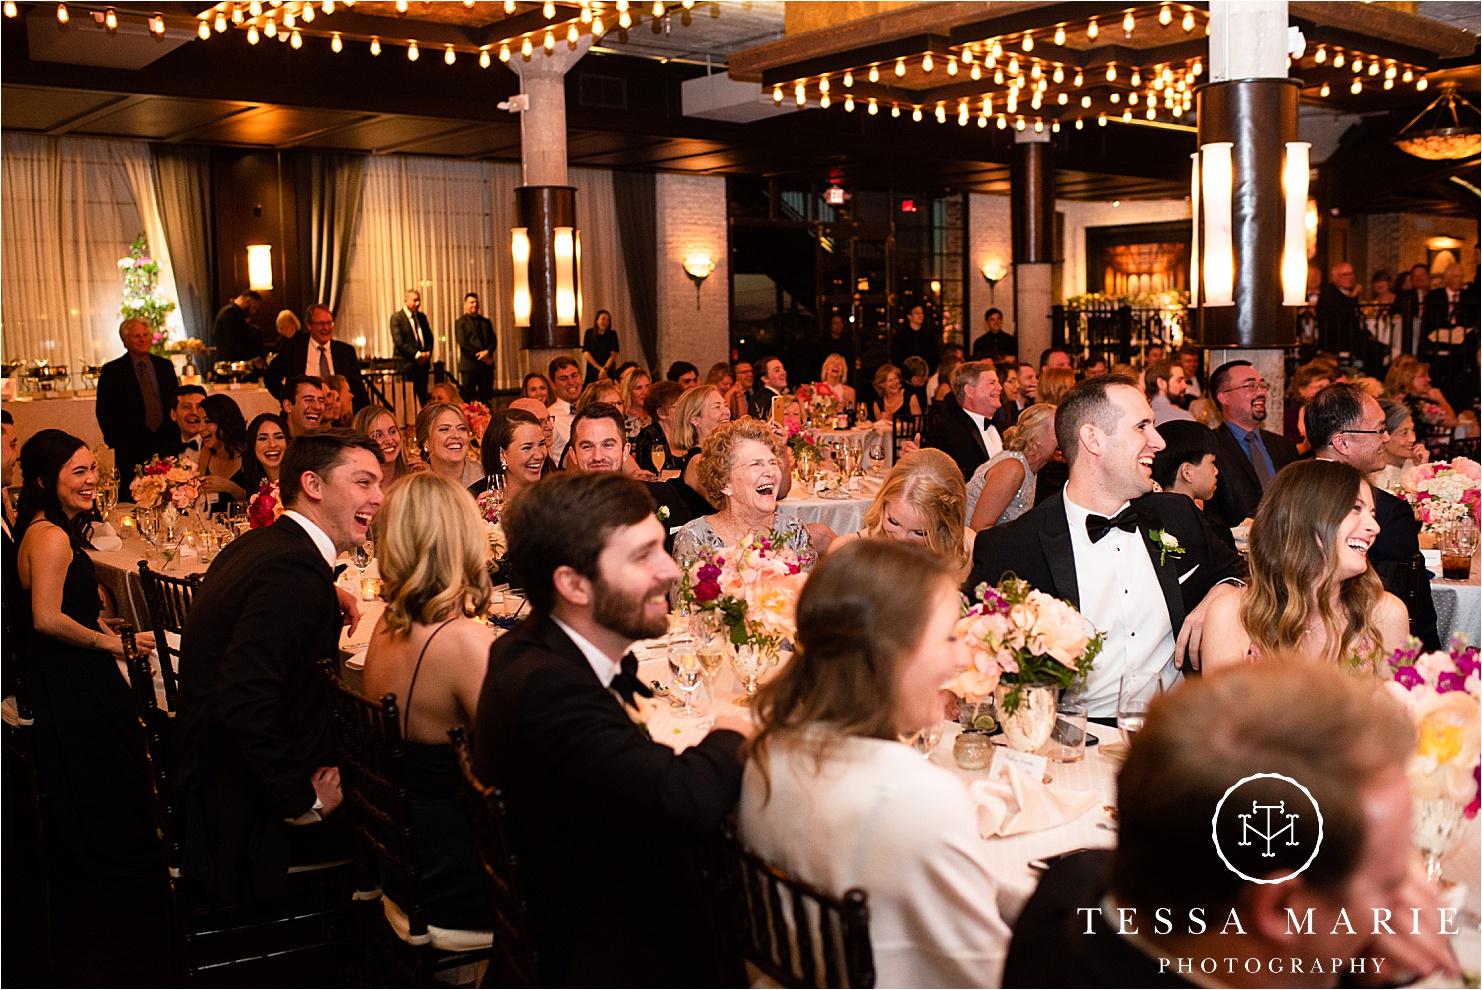 Tessa_marie_weddings_houston_wedding_photographer_The_astorian_0158.jpg